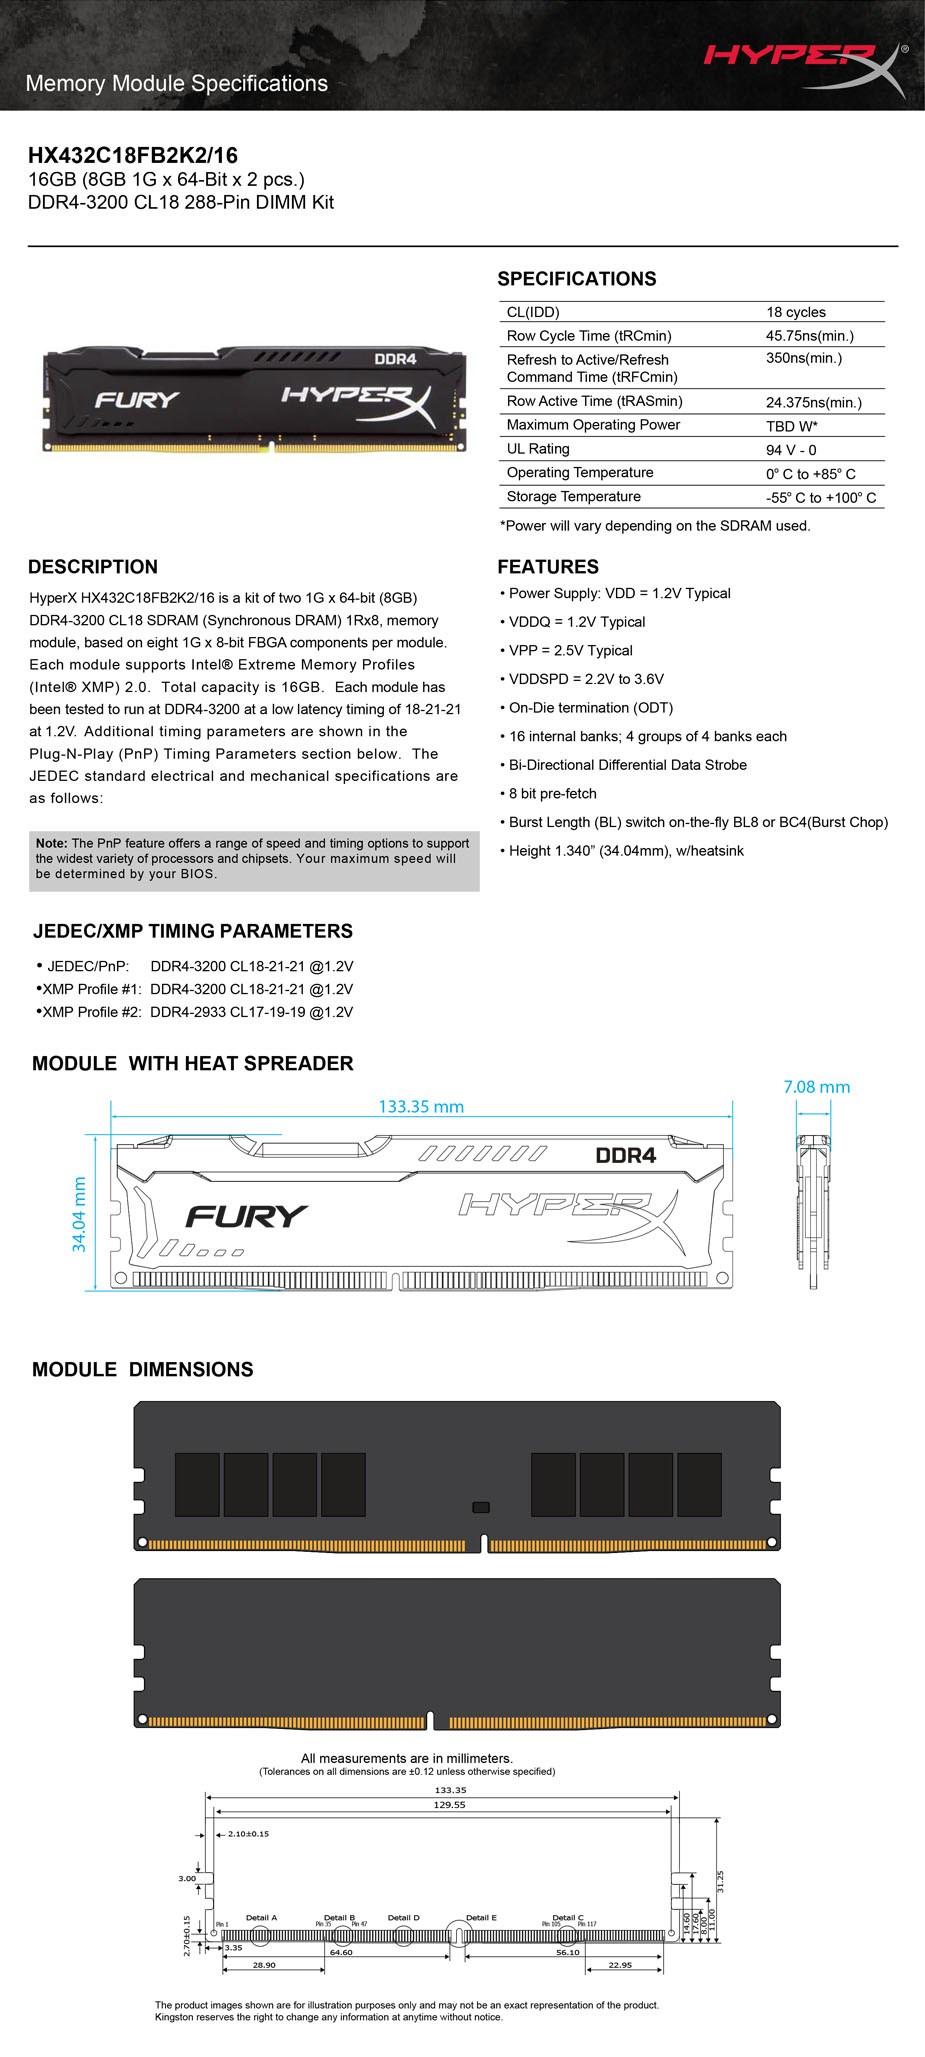 Kingston HyperX FURY 16GB (2x 8GB) DDR4 3200MHz Memory Black - Overview 2